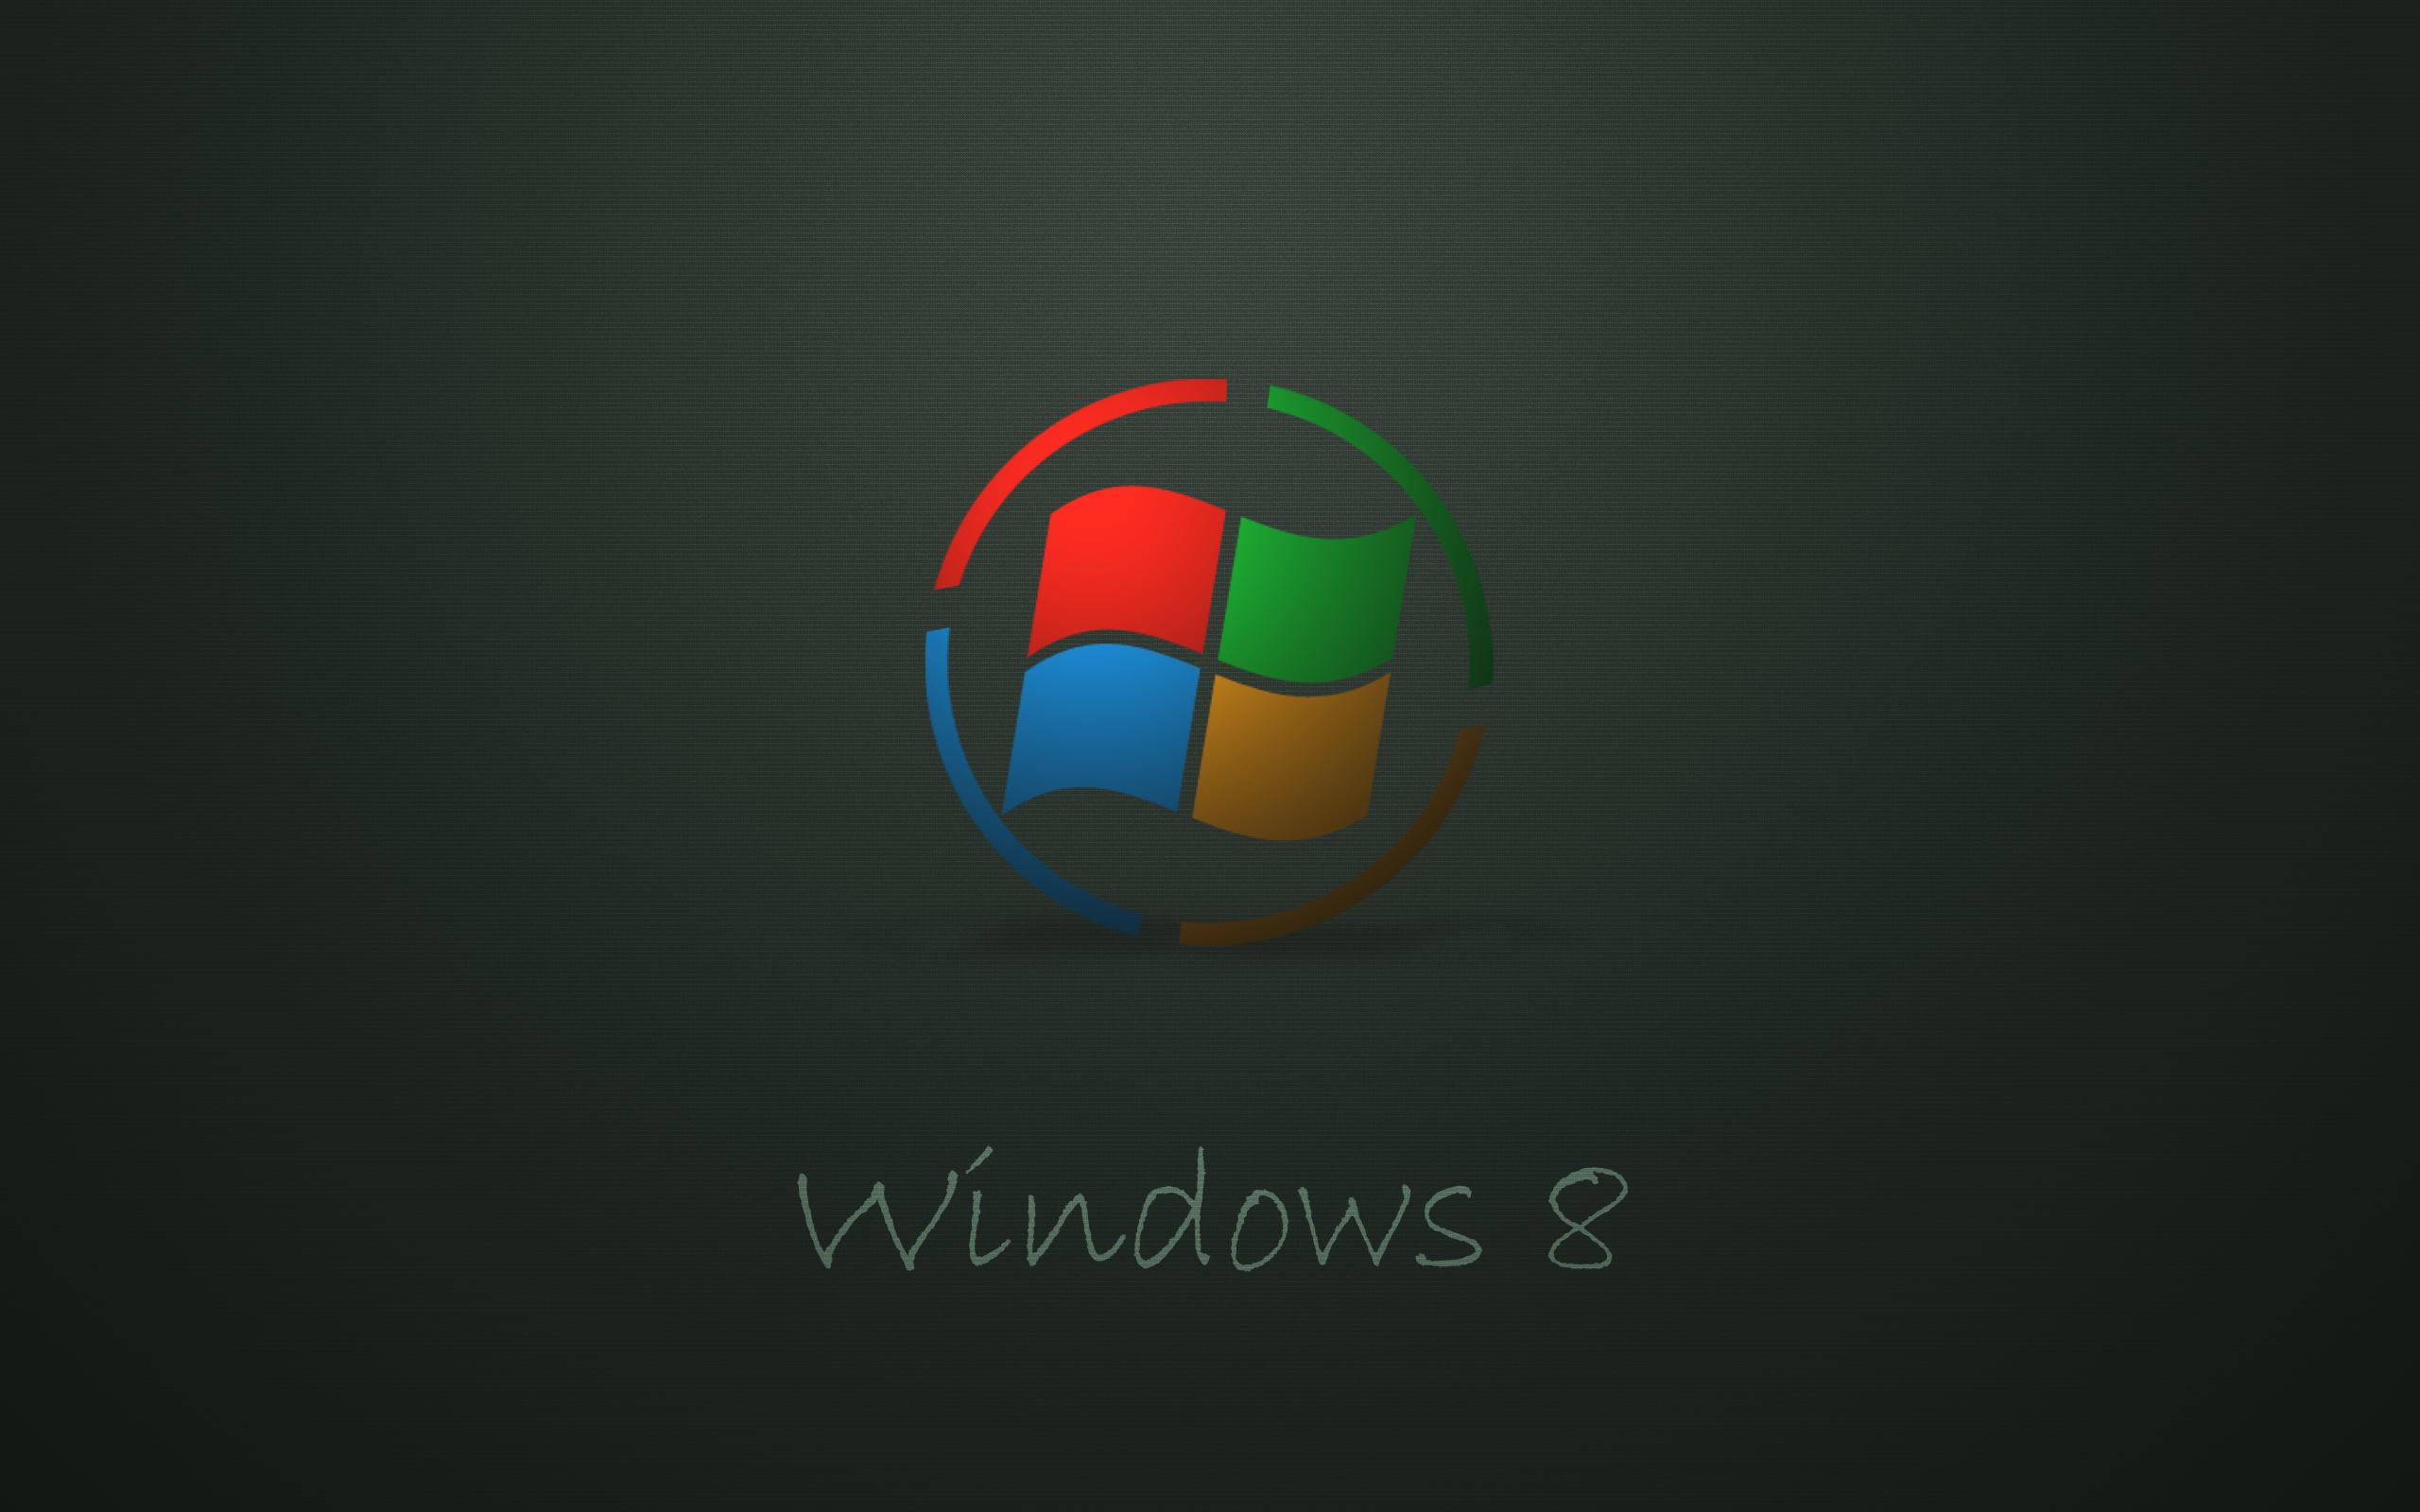 Top Wallpaper High Quality Windows 8 - windows-8-wallpapers-42  2018_796514.jpg